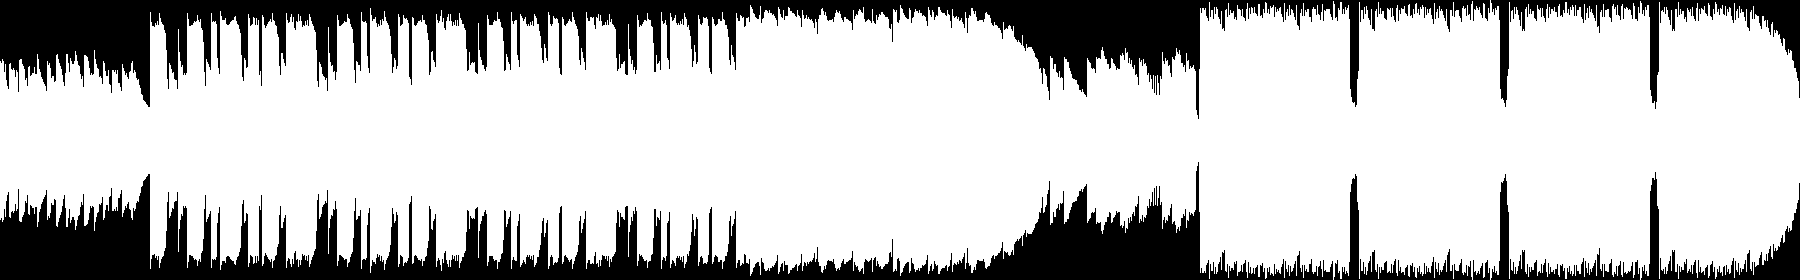 Serum 808 audio waveform